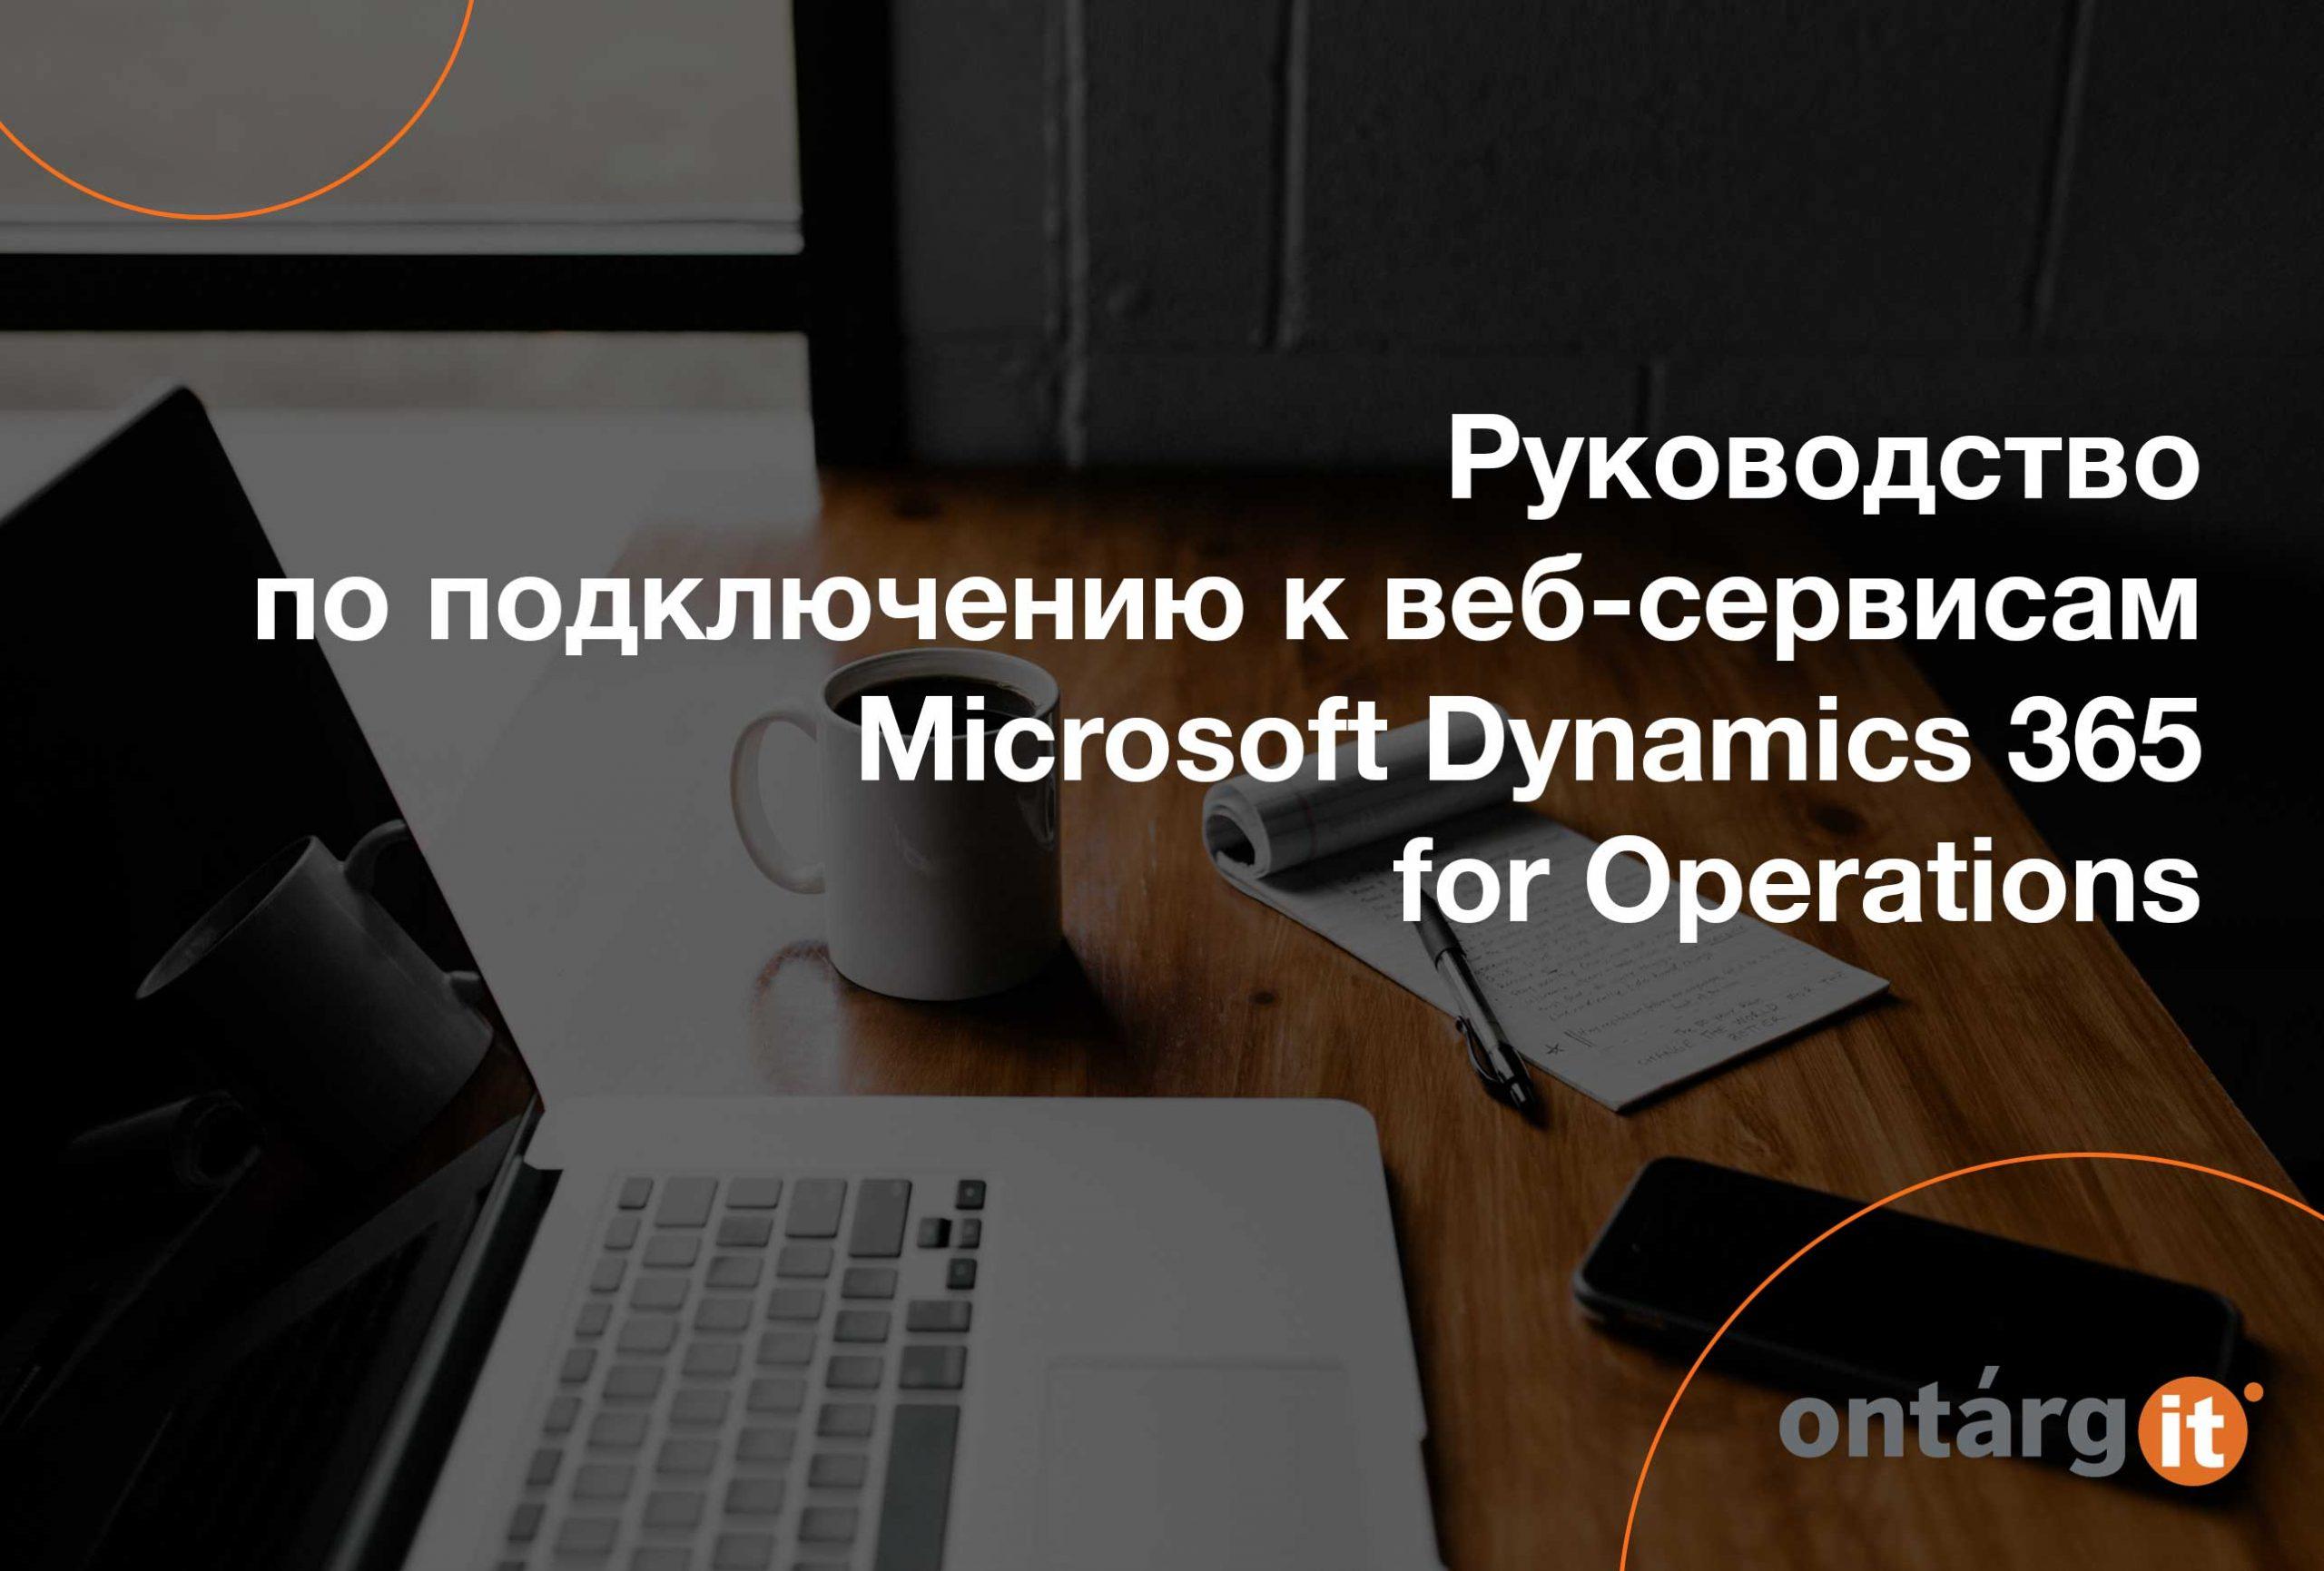 Руководство-по-подключению-к-веб-сервисам-Microsoft-Dynamics-365-for-Operations